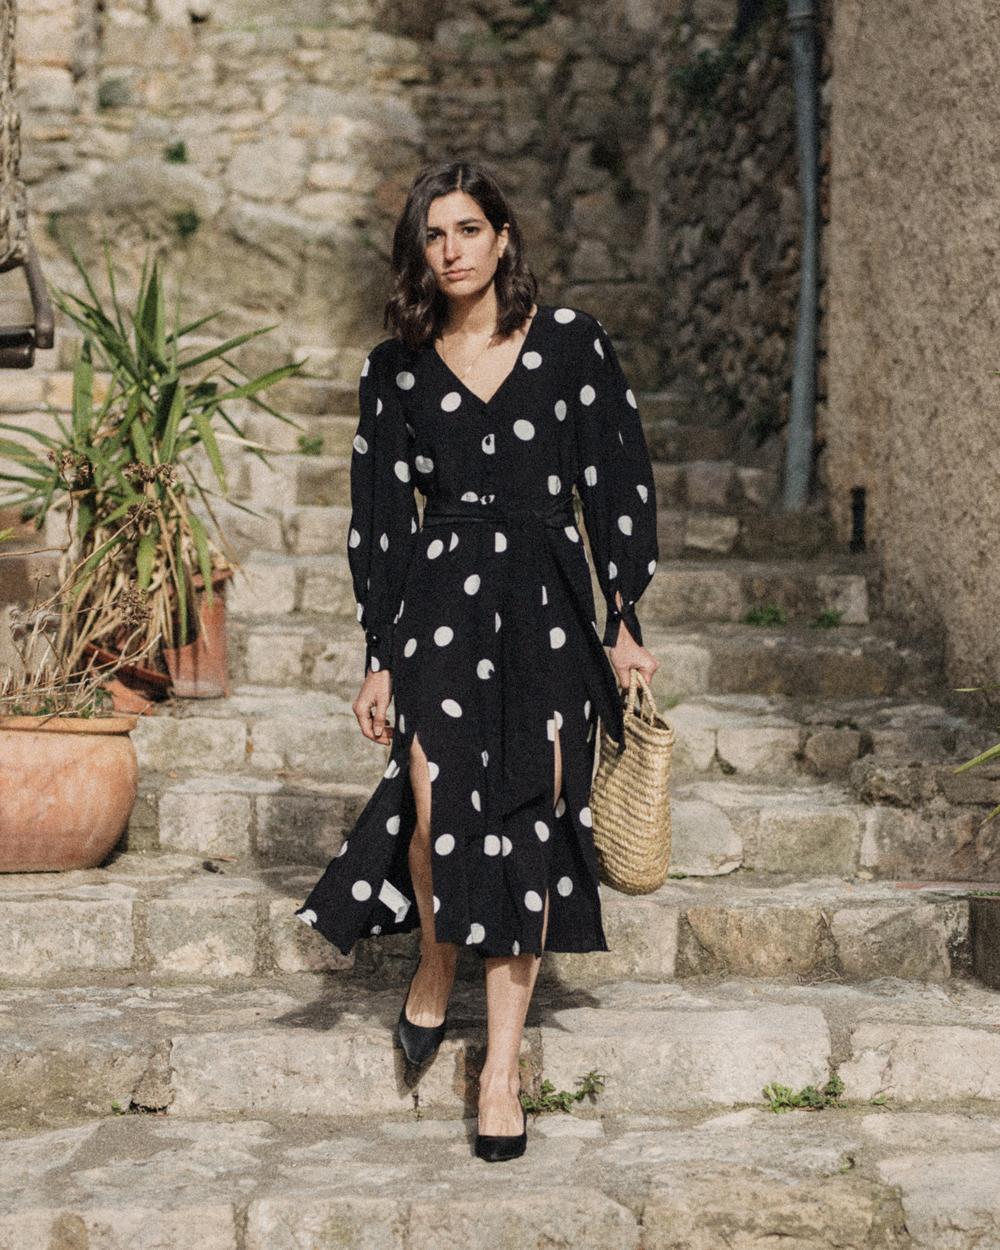 A Polka Dot Dress And A Basket Bag Aria Di Bari